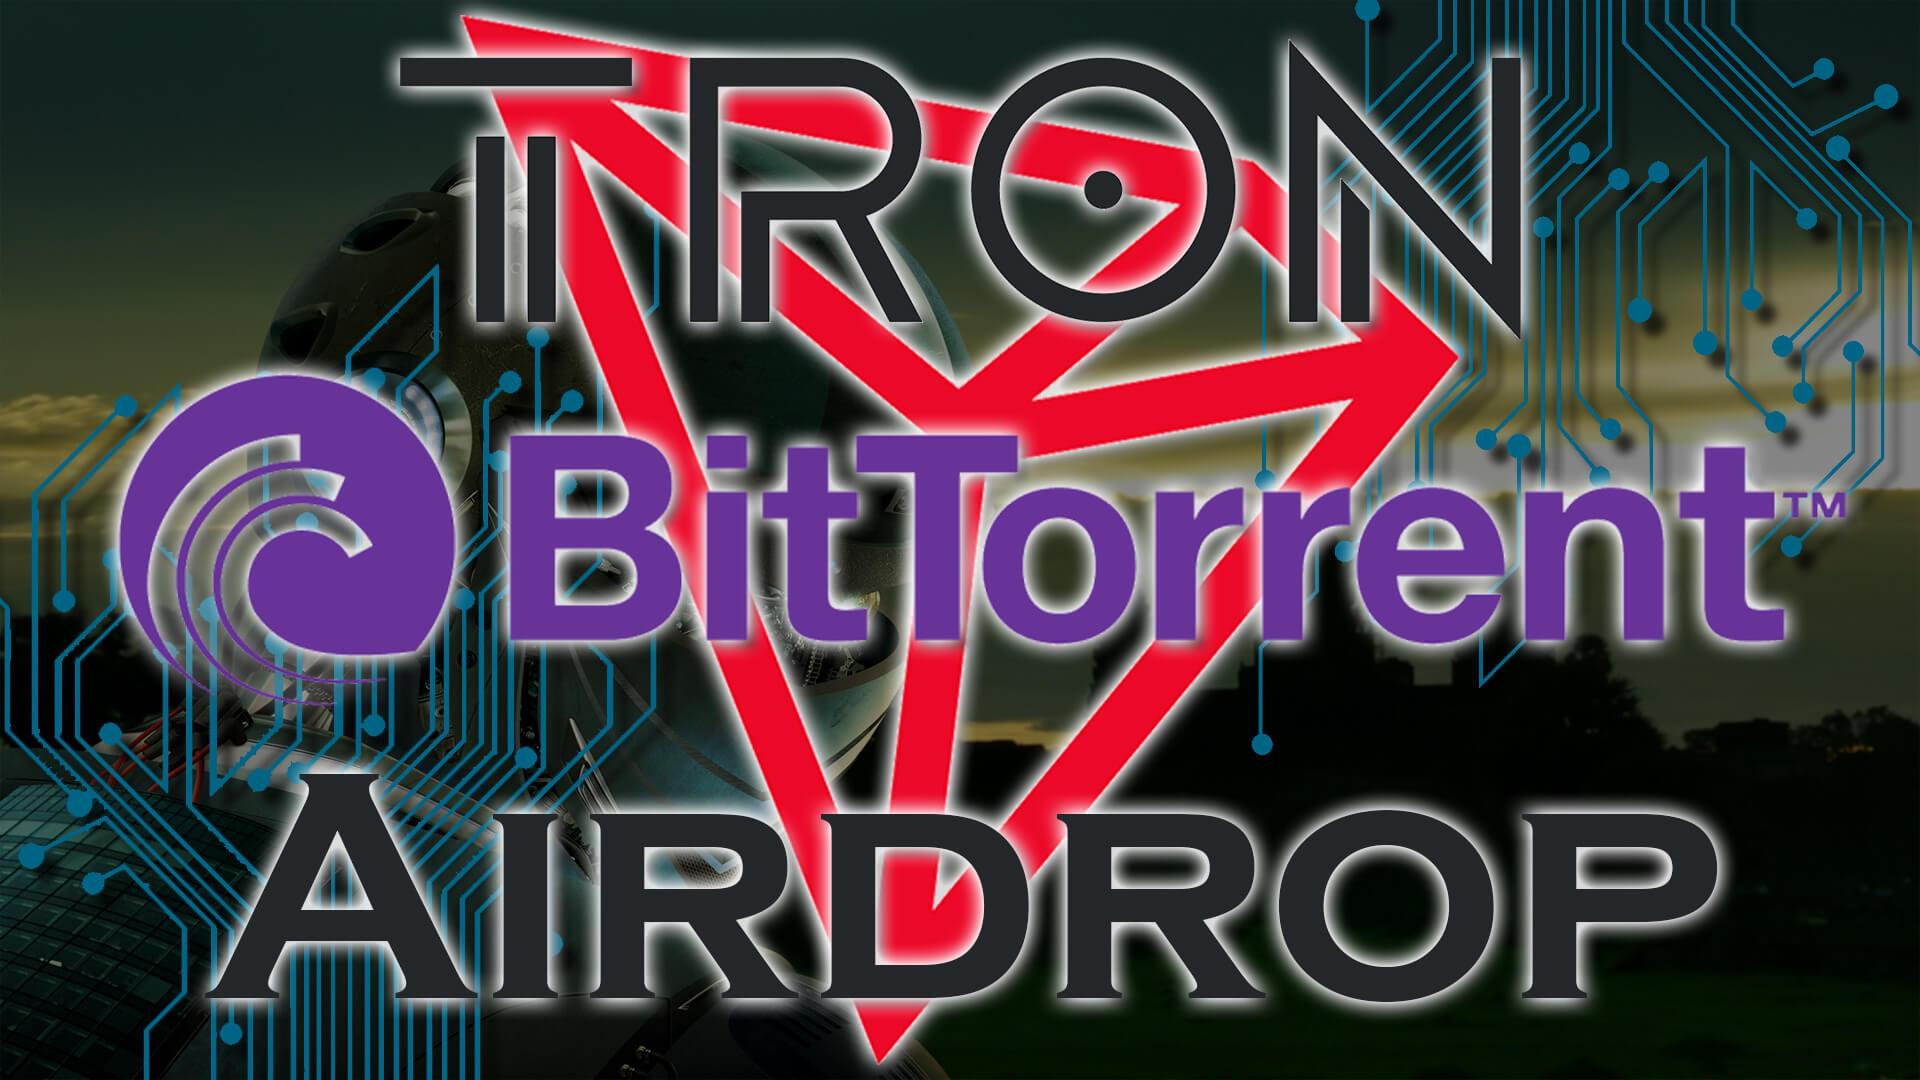 tron-bittorrent-coin-airdrop-graphic